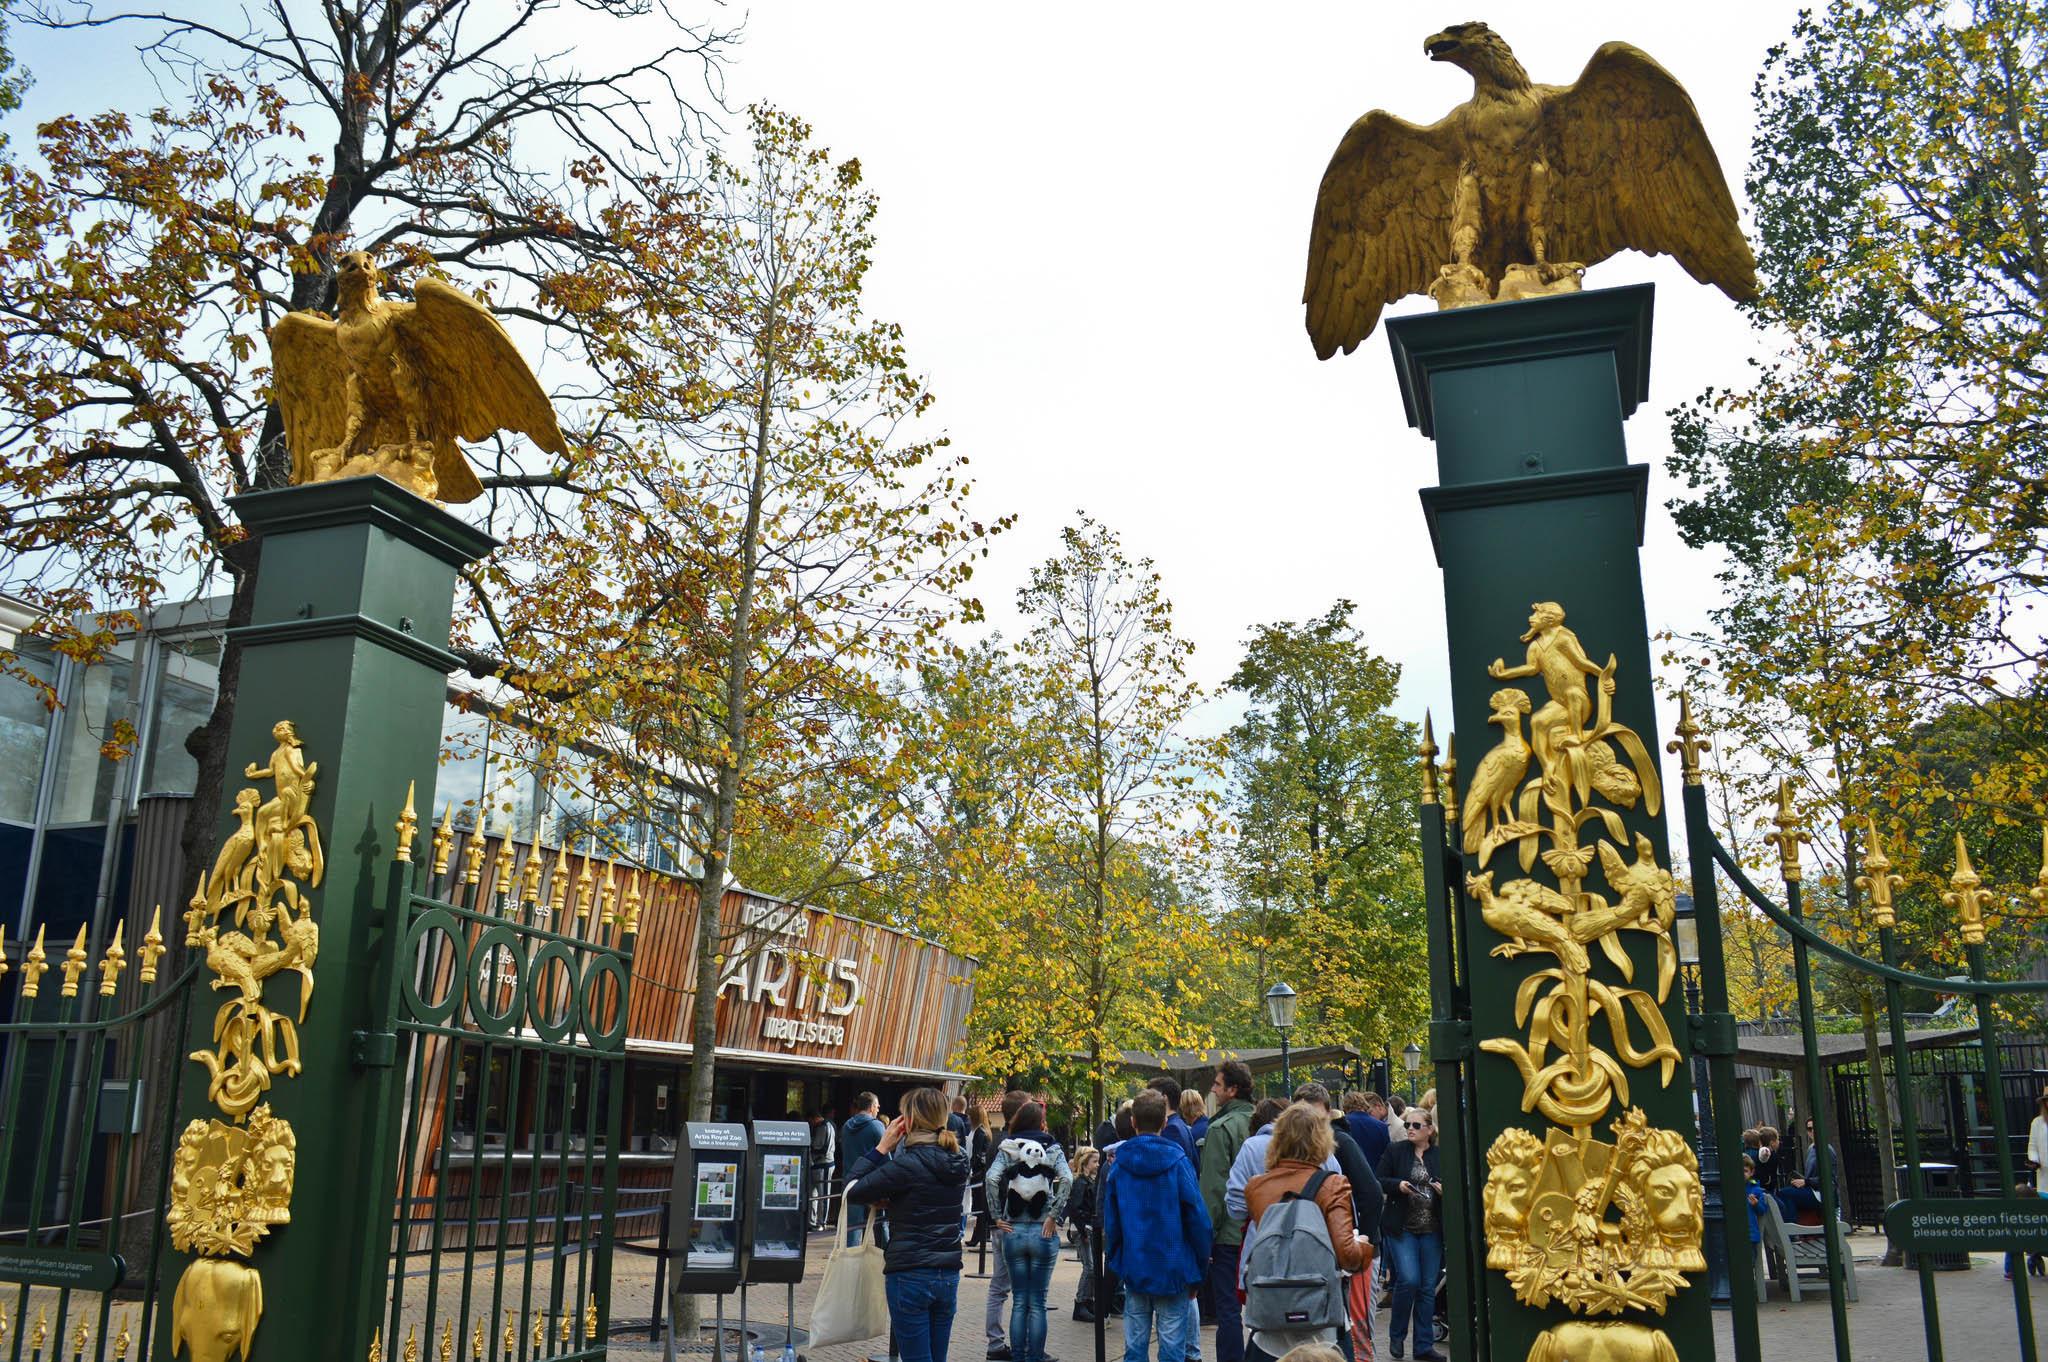 Exploring Amsterdam Zoo